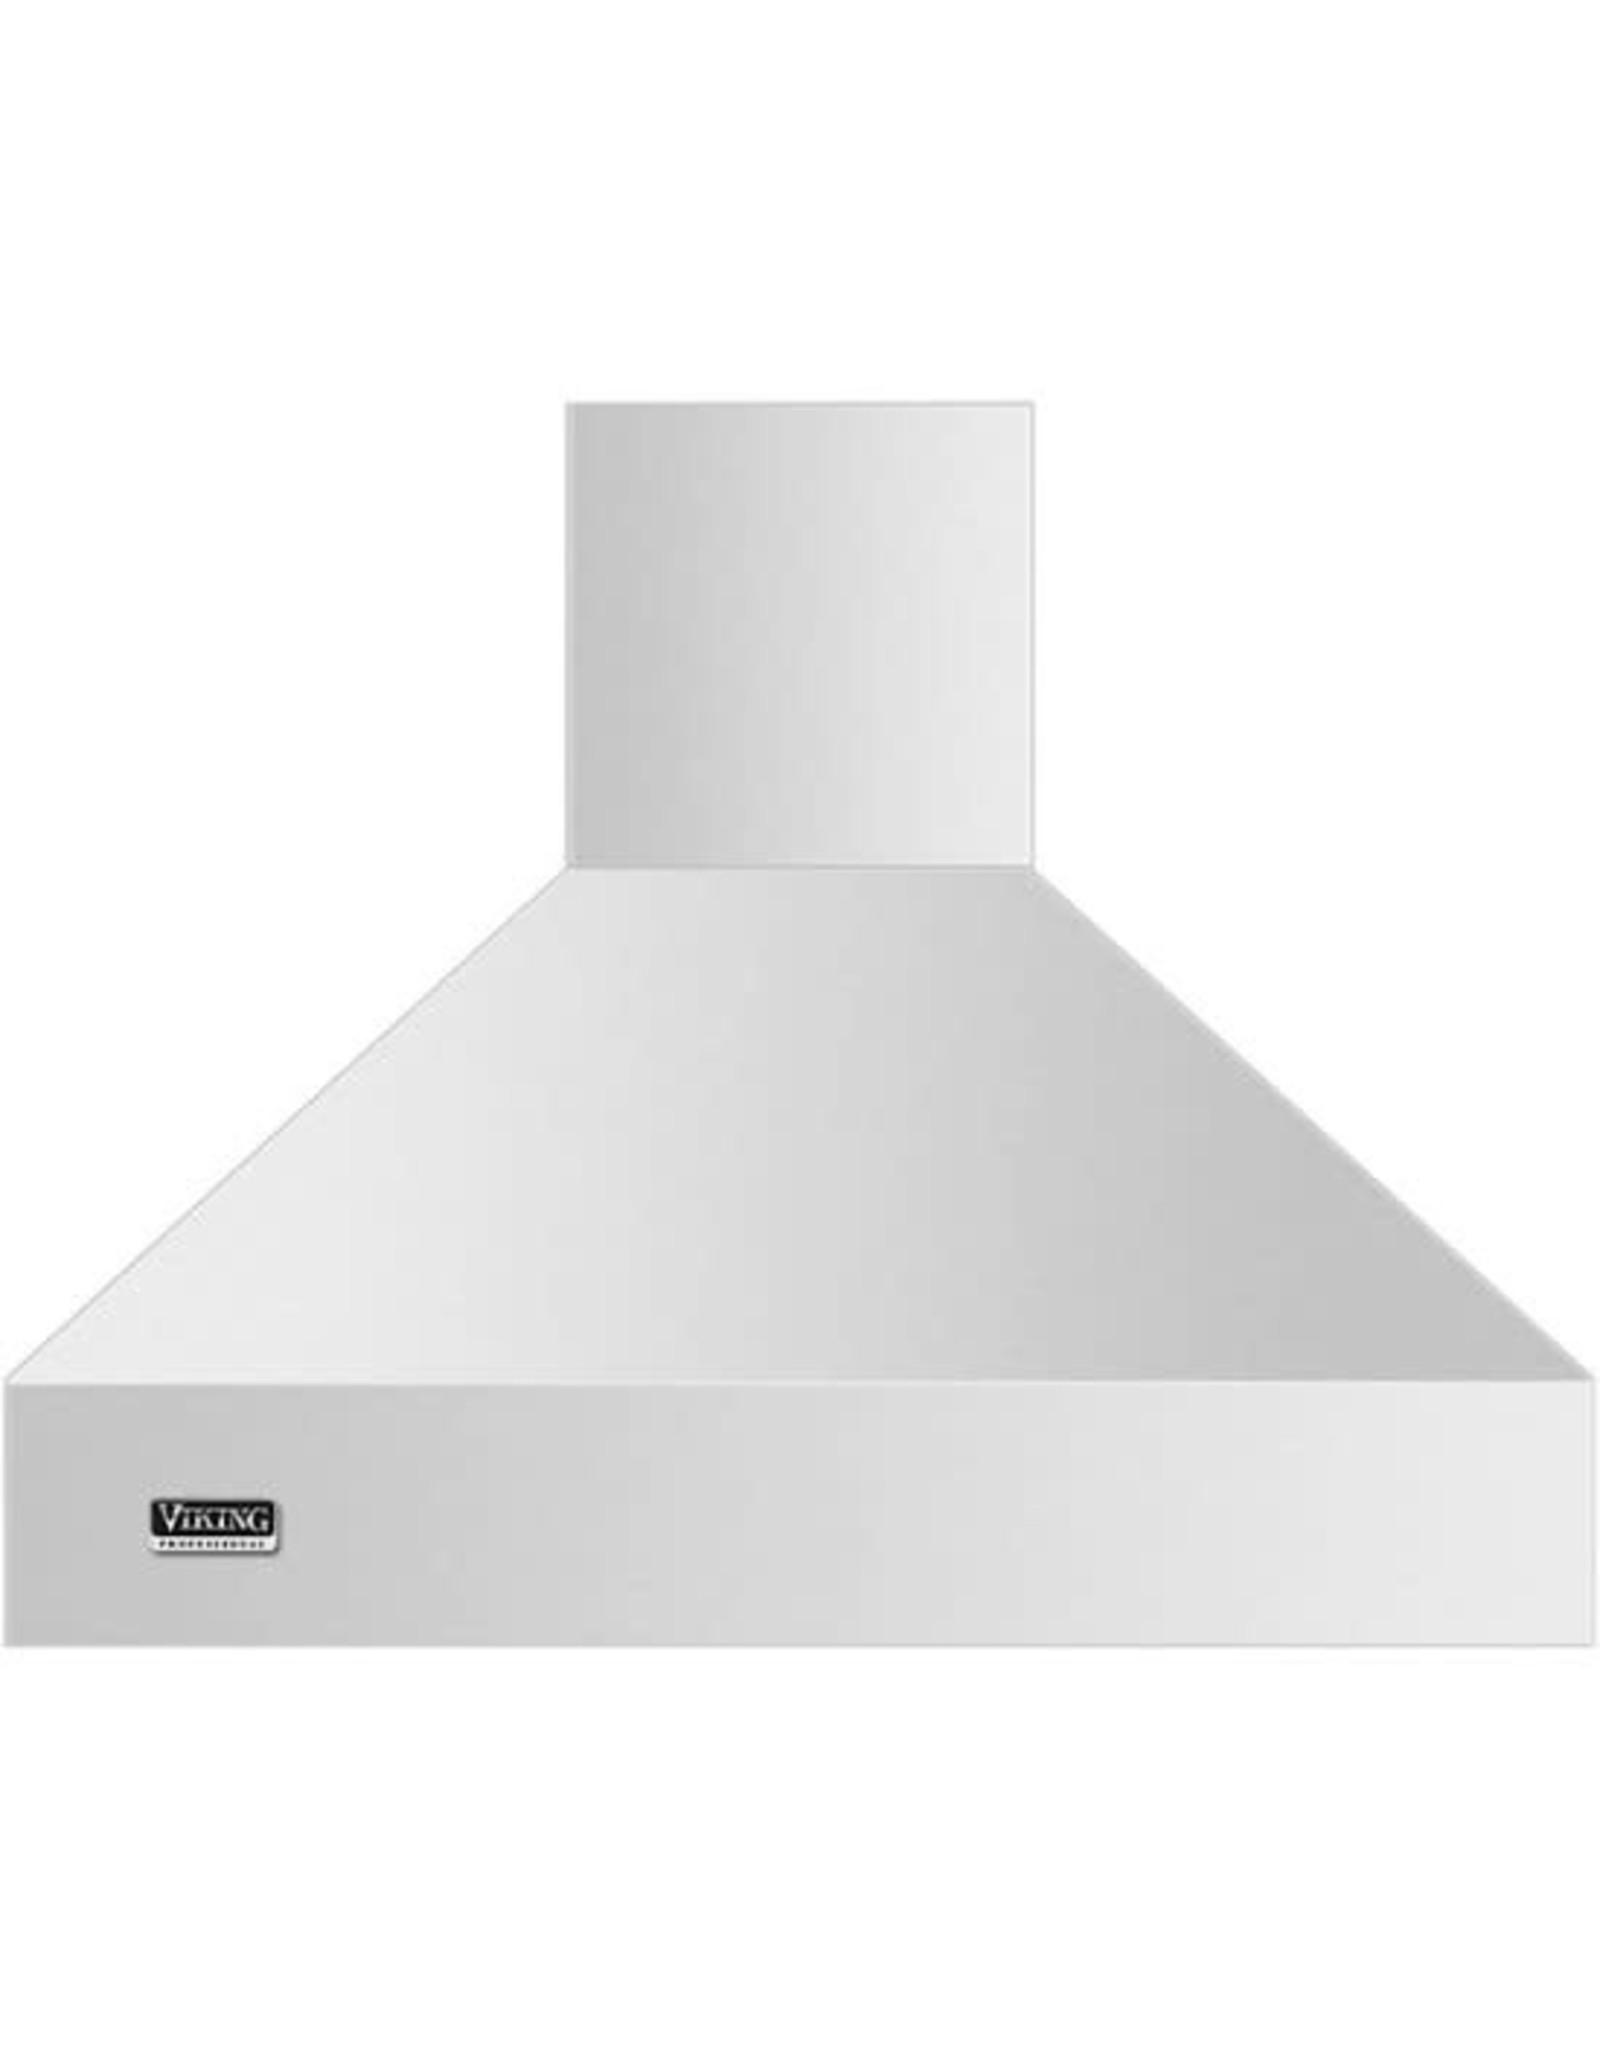 "viking VCWH53648SS00  Professional 5 Series 36"" Range Hood - Stainless steel Model:VCWH53648SSSKU:8936895"